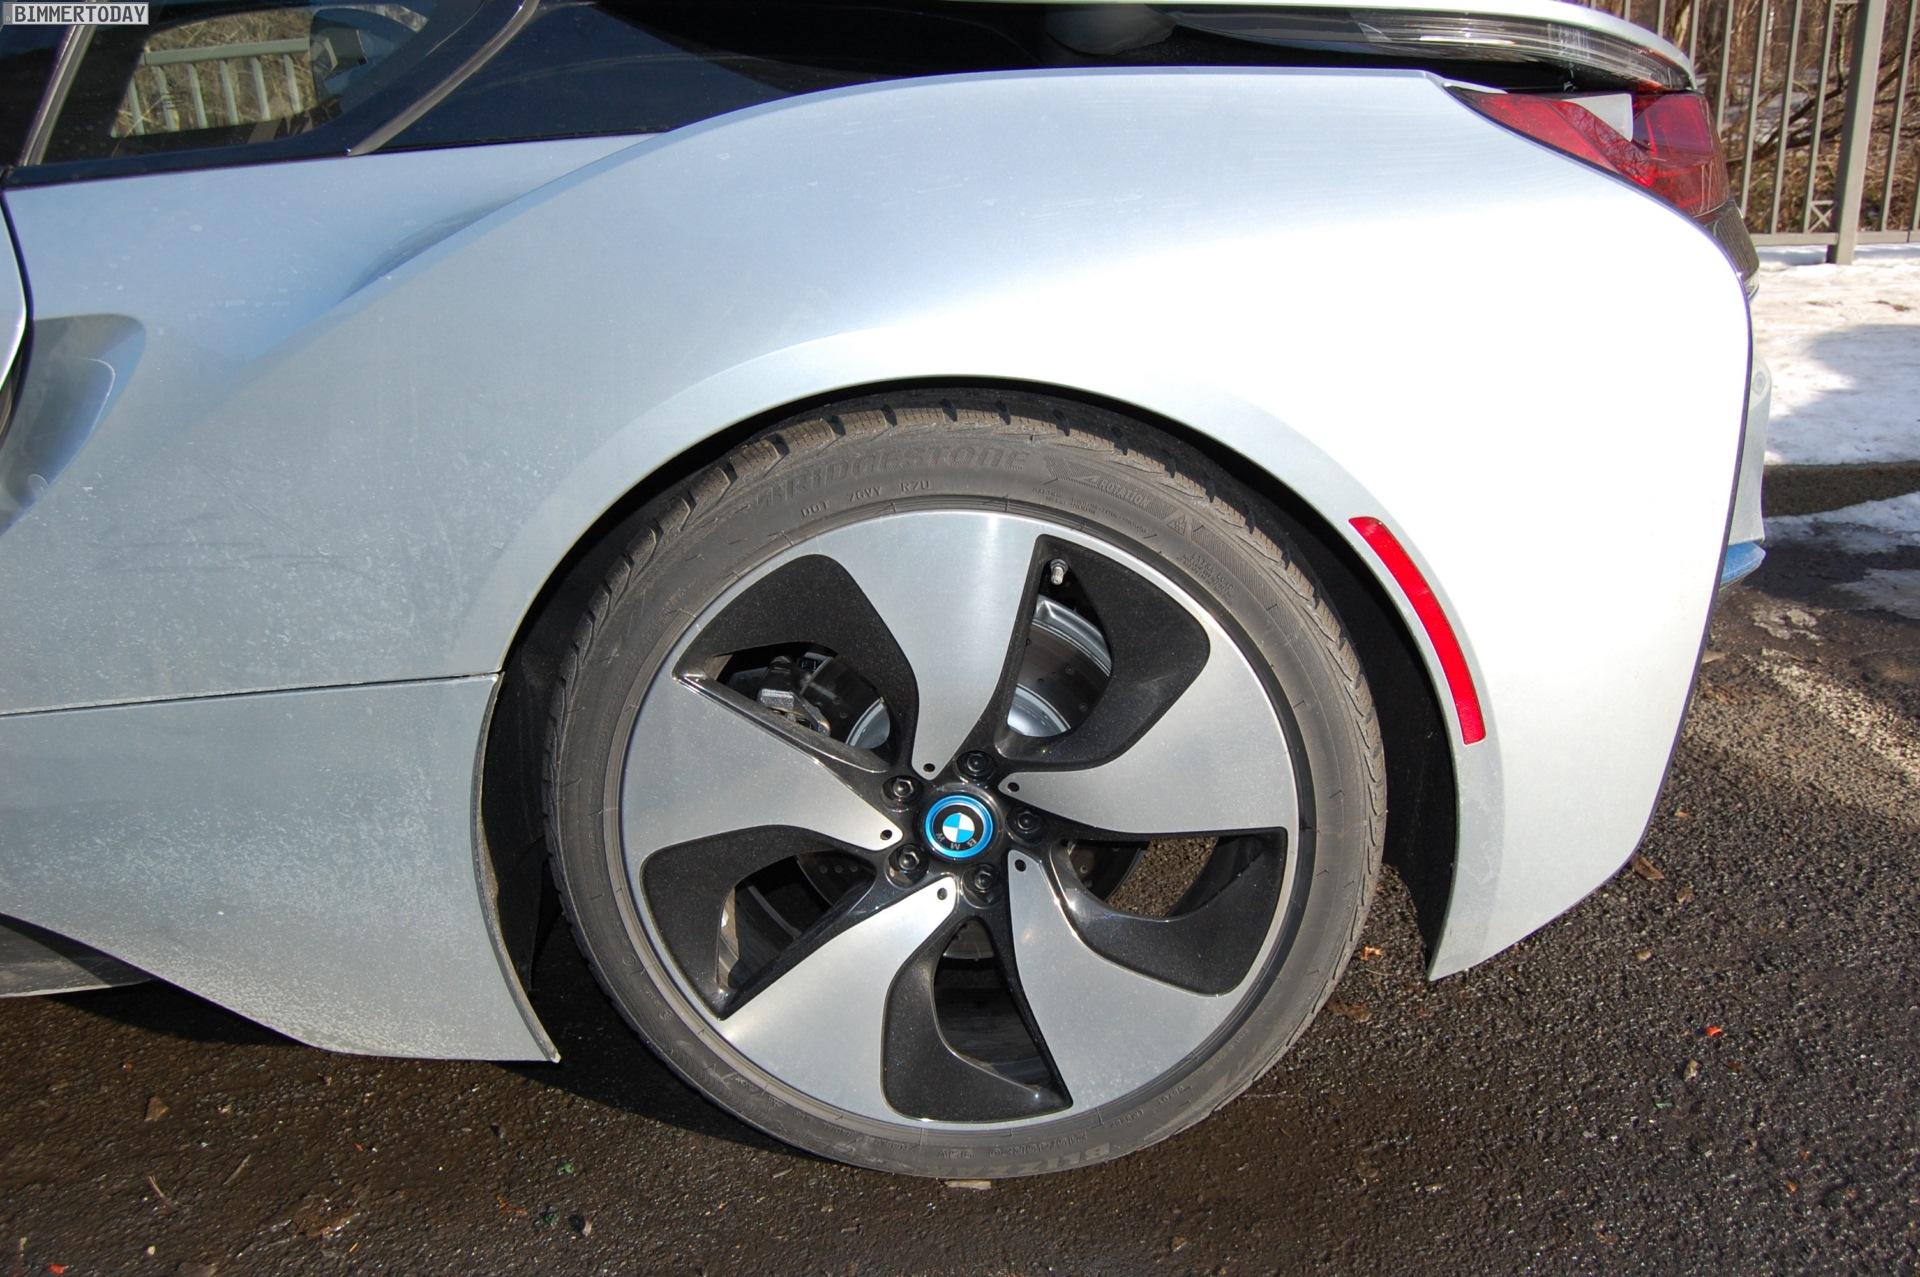 BMW i8 Live Fotos Ionic Silver Akzent i Blau Leipzig 10